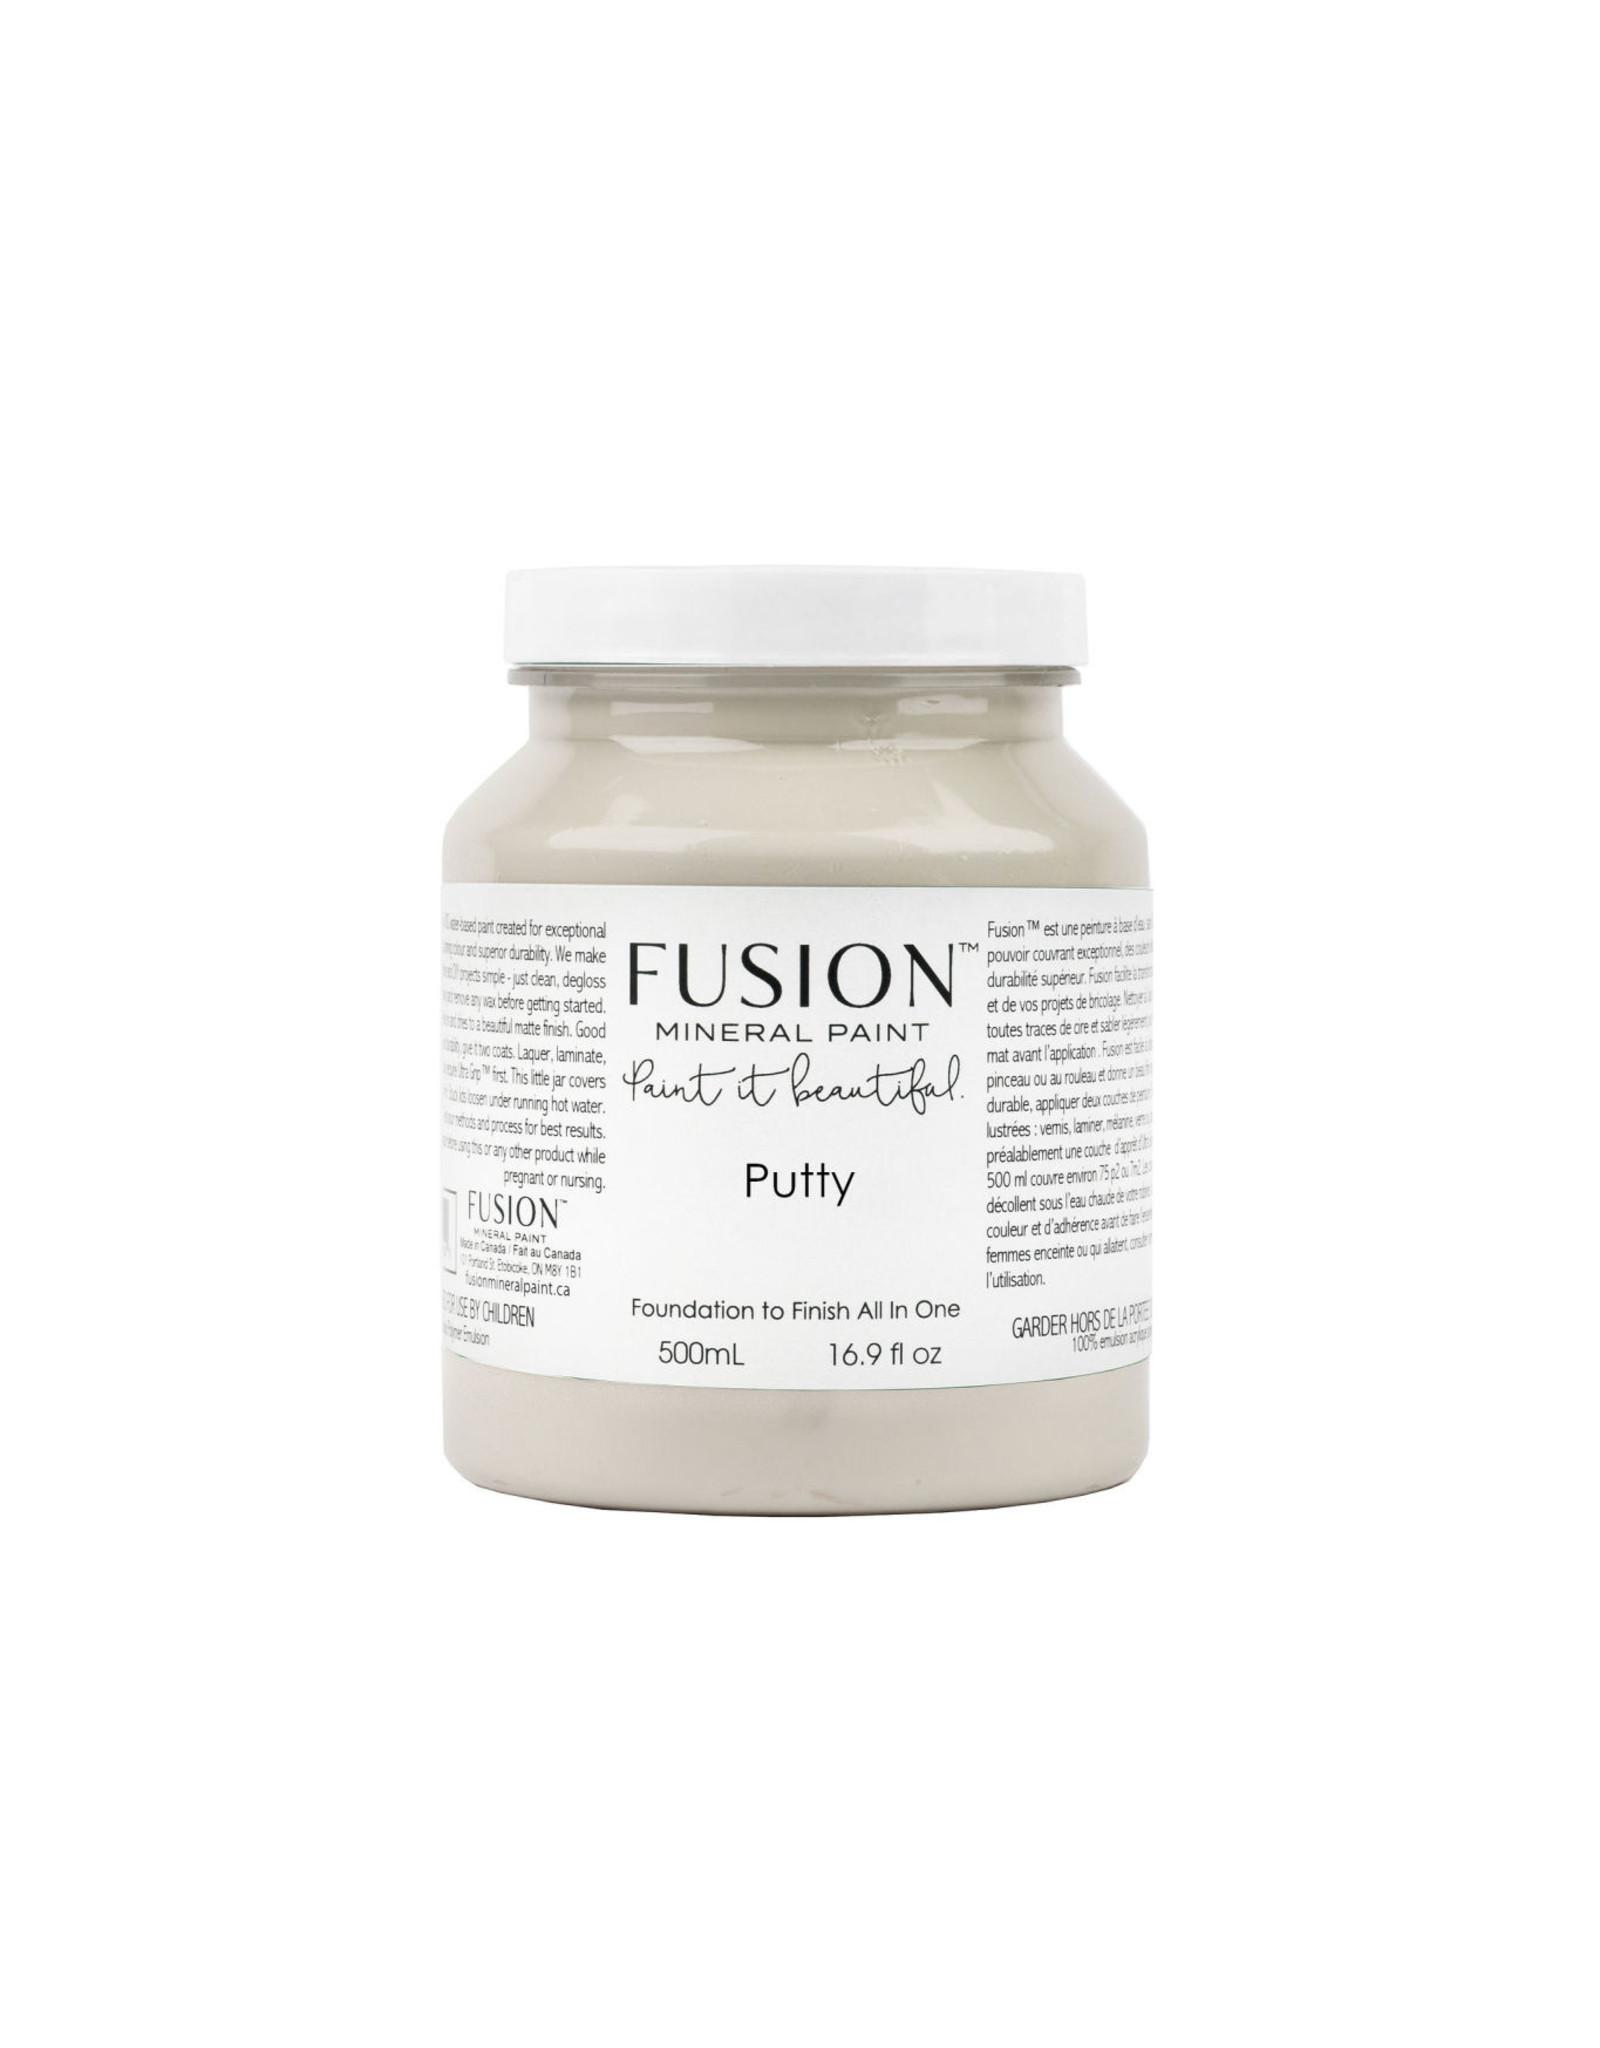 Fusion Mineral Paint Fusion Mineral Paint - Putty 500ml